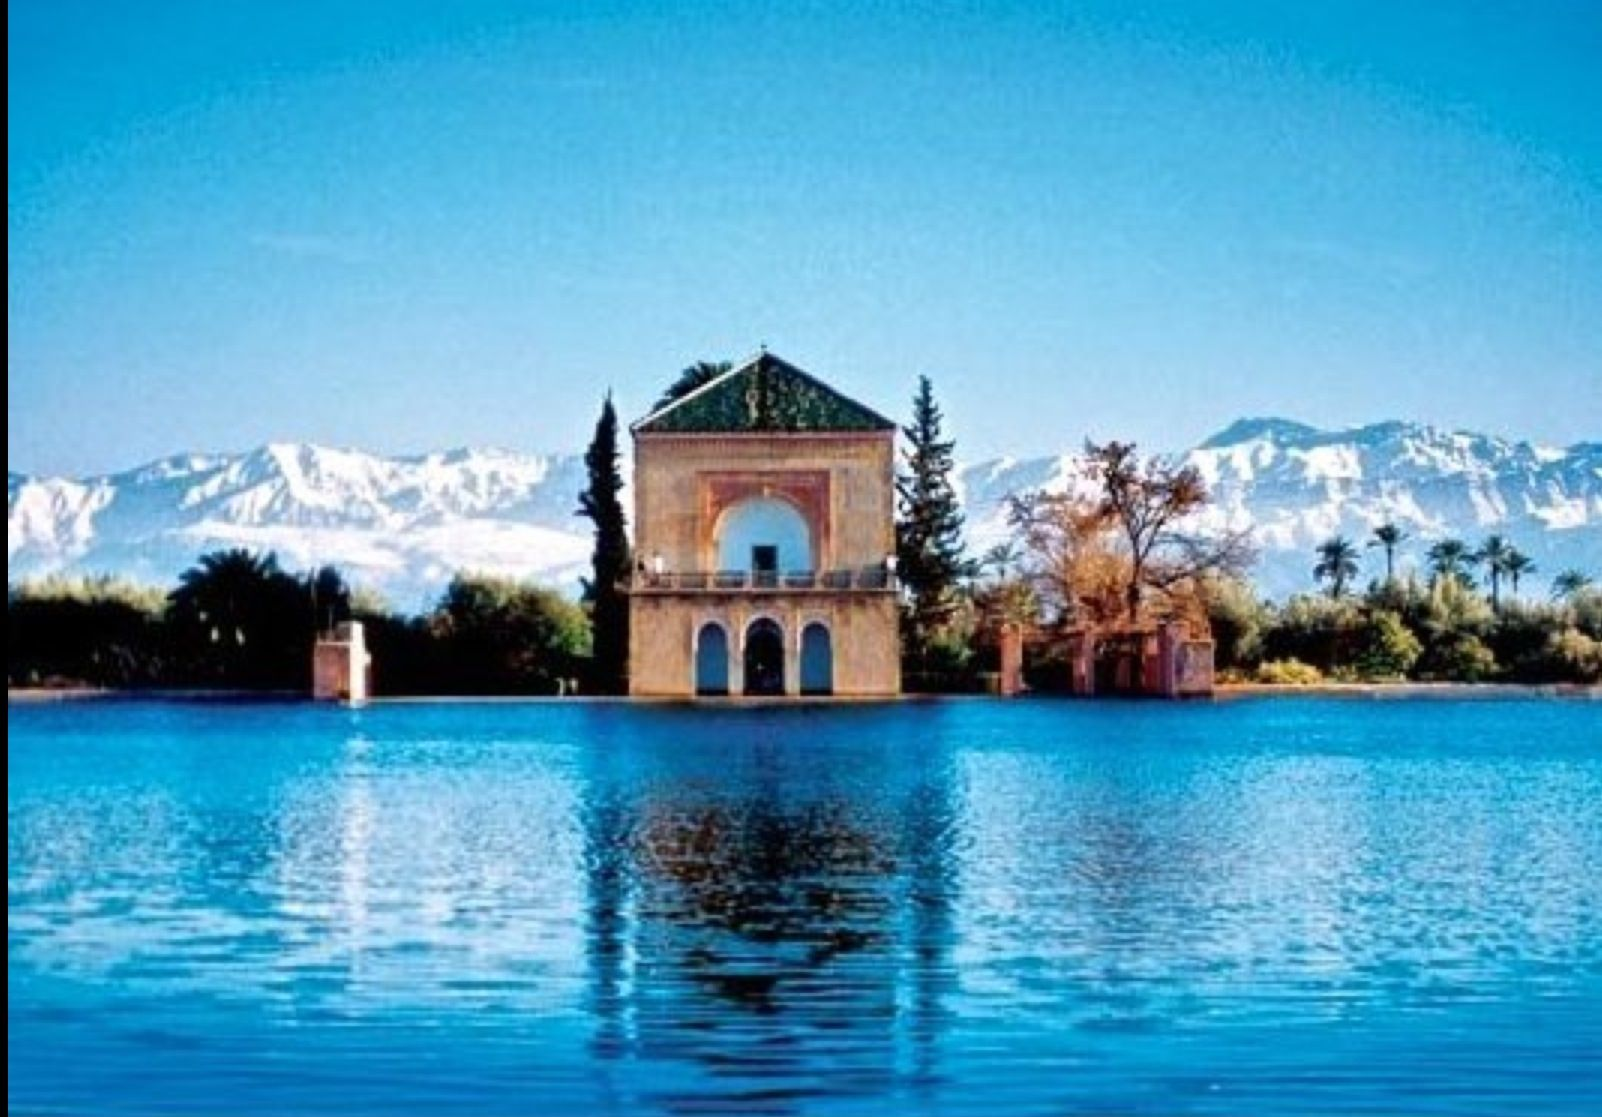 Marrakech Morocco With Snow Clad Atlas Mountains Morocco Lovely Trip Pinterest